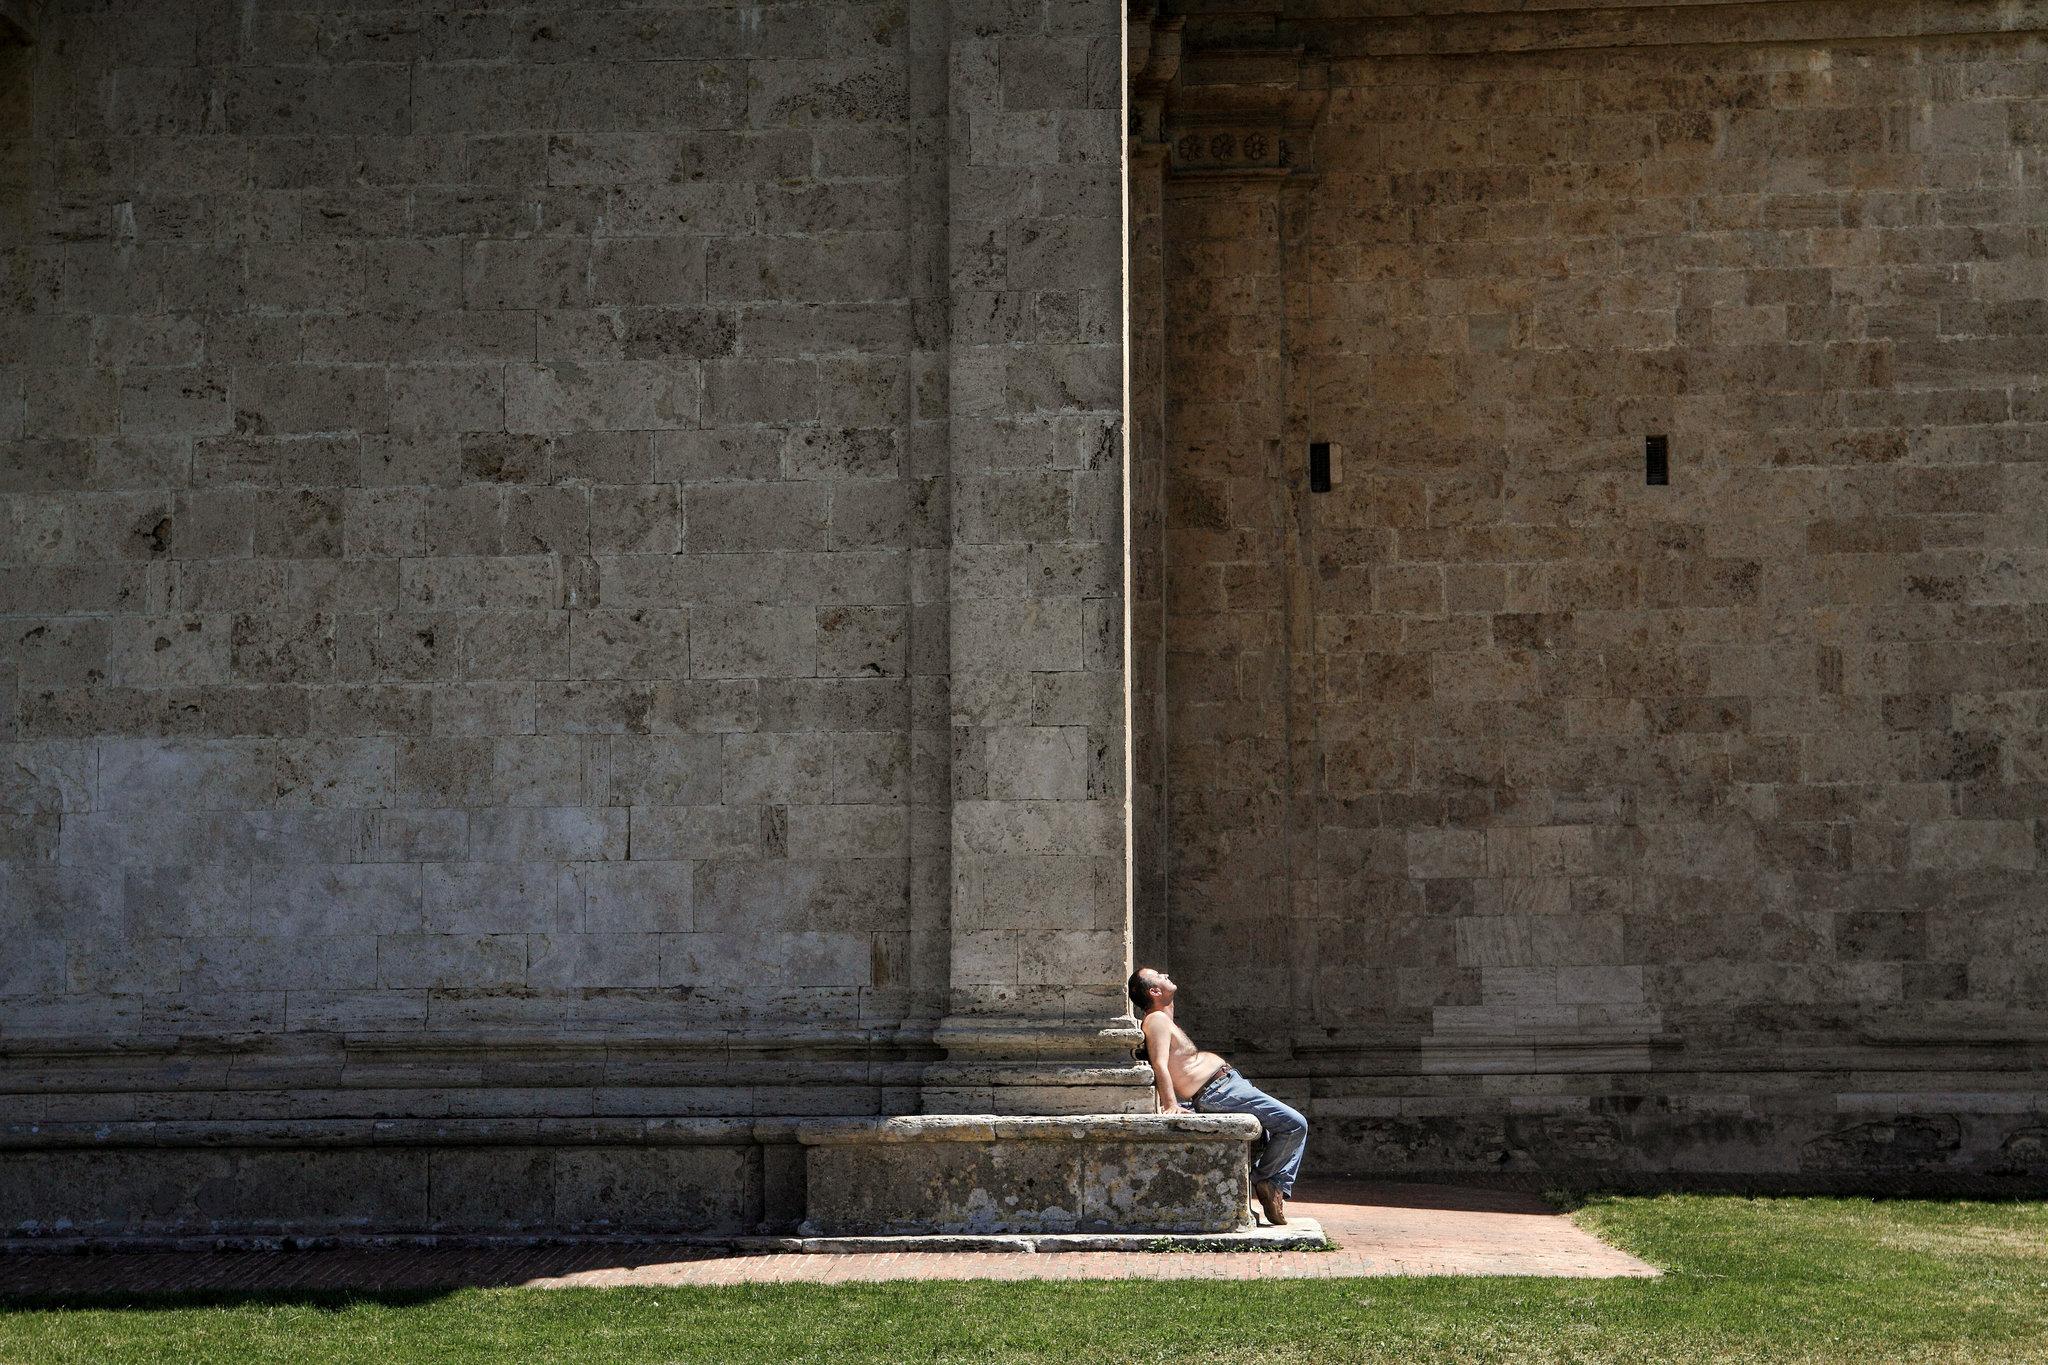 Montepulciano-IMG_2341.jpg